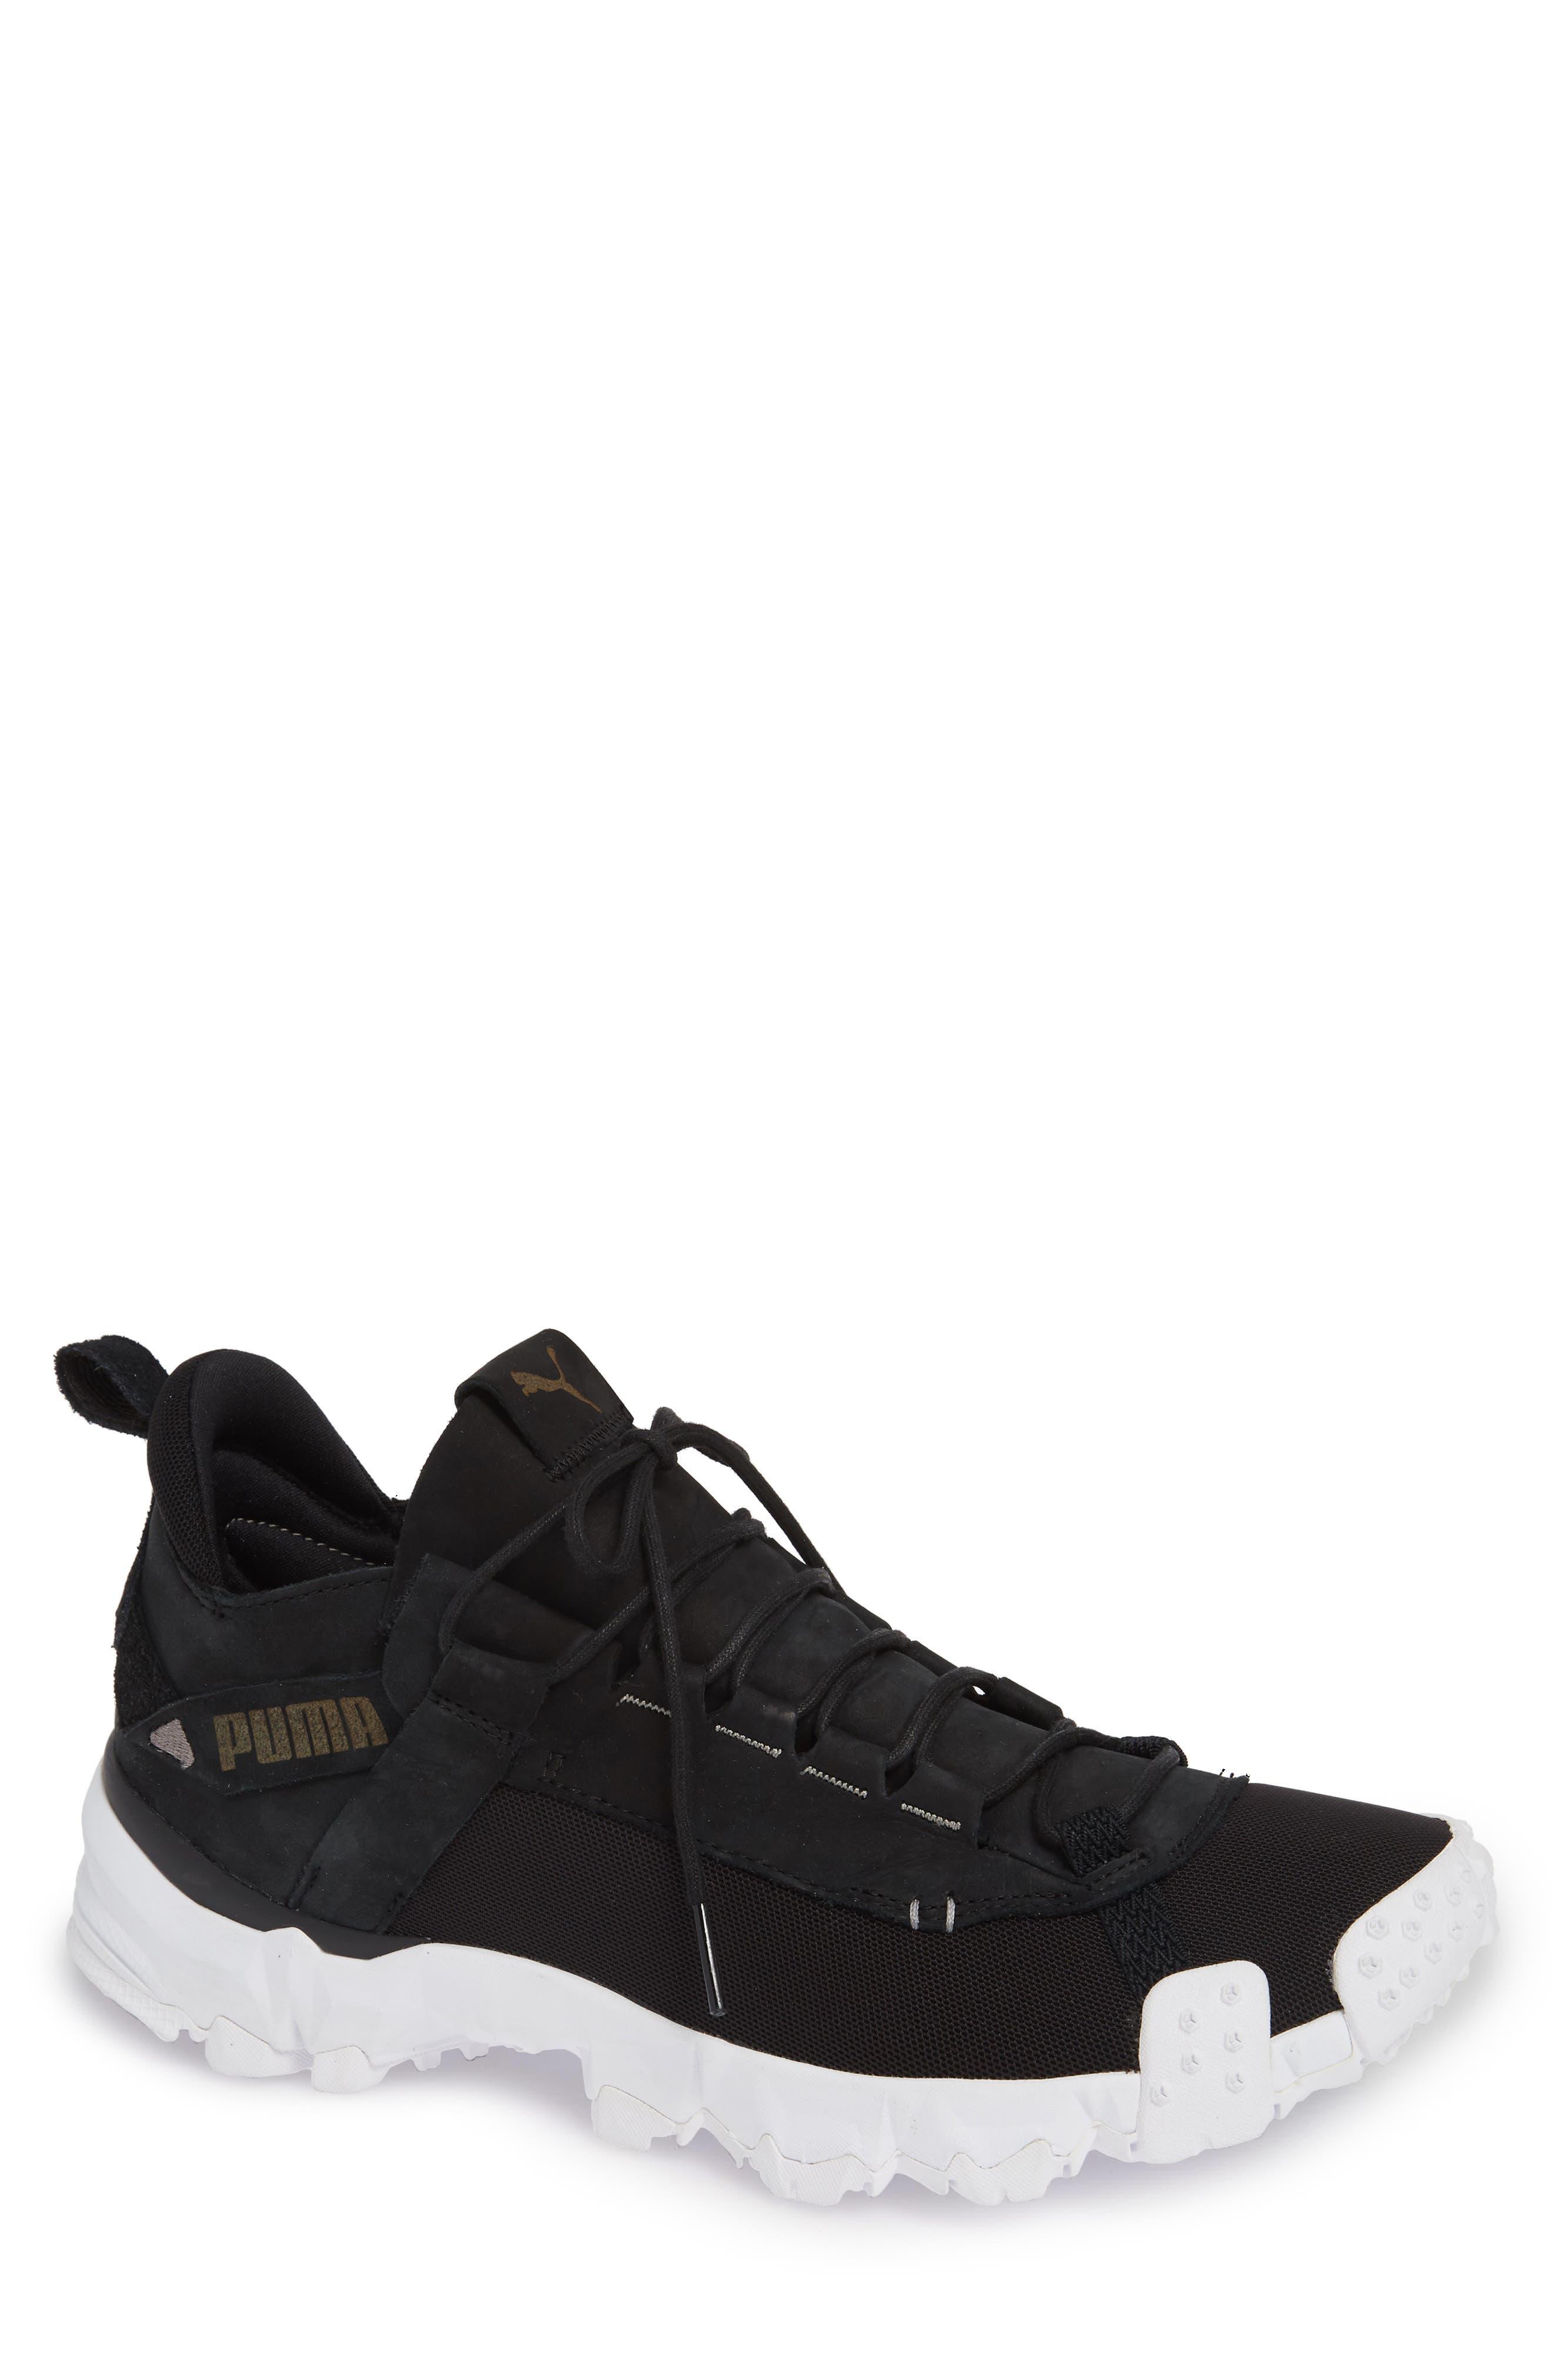 Trailfox Sneaker,                             Main thumbnail 1, color,                             BLACK/ WHITE